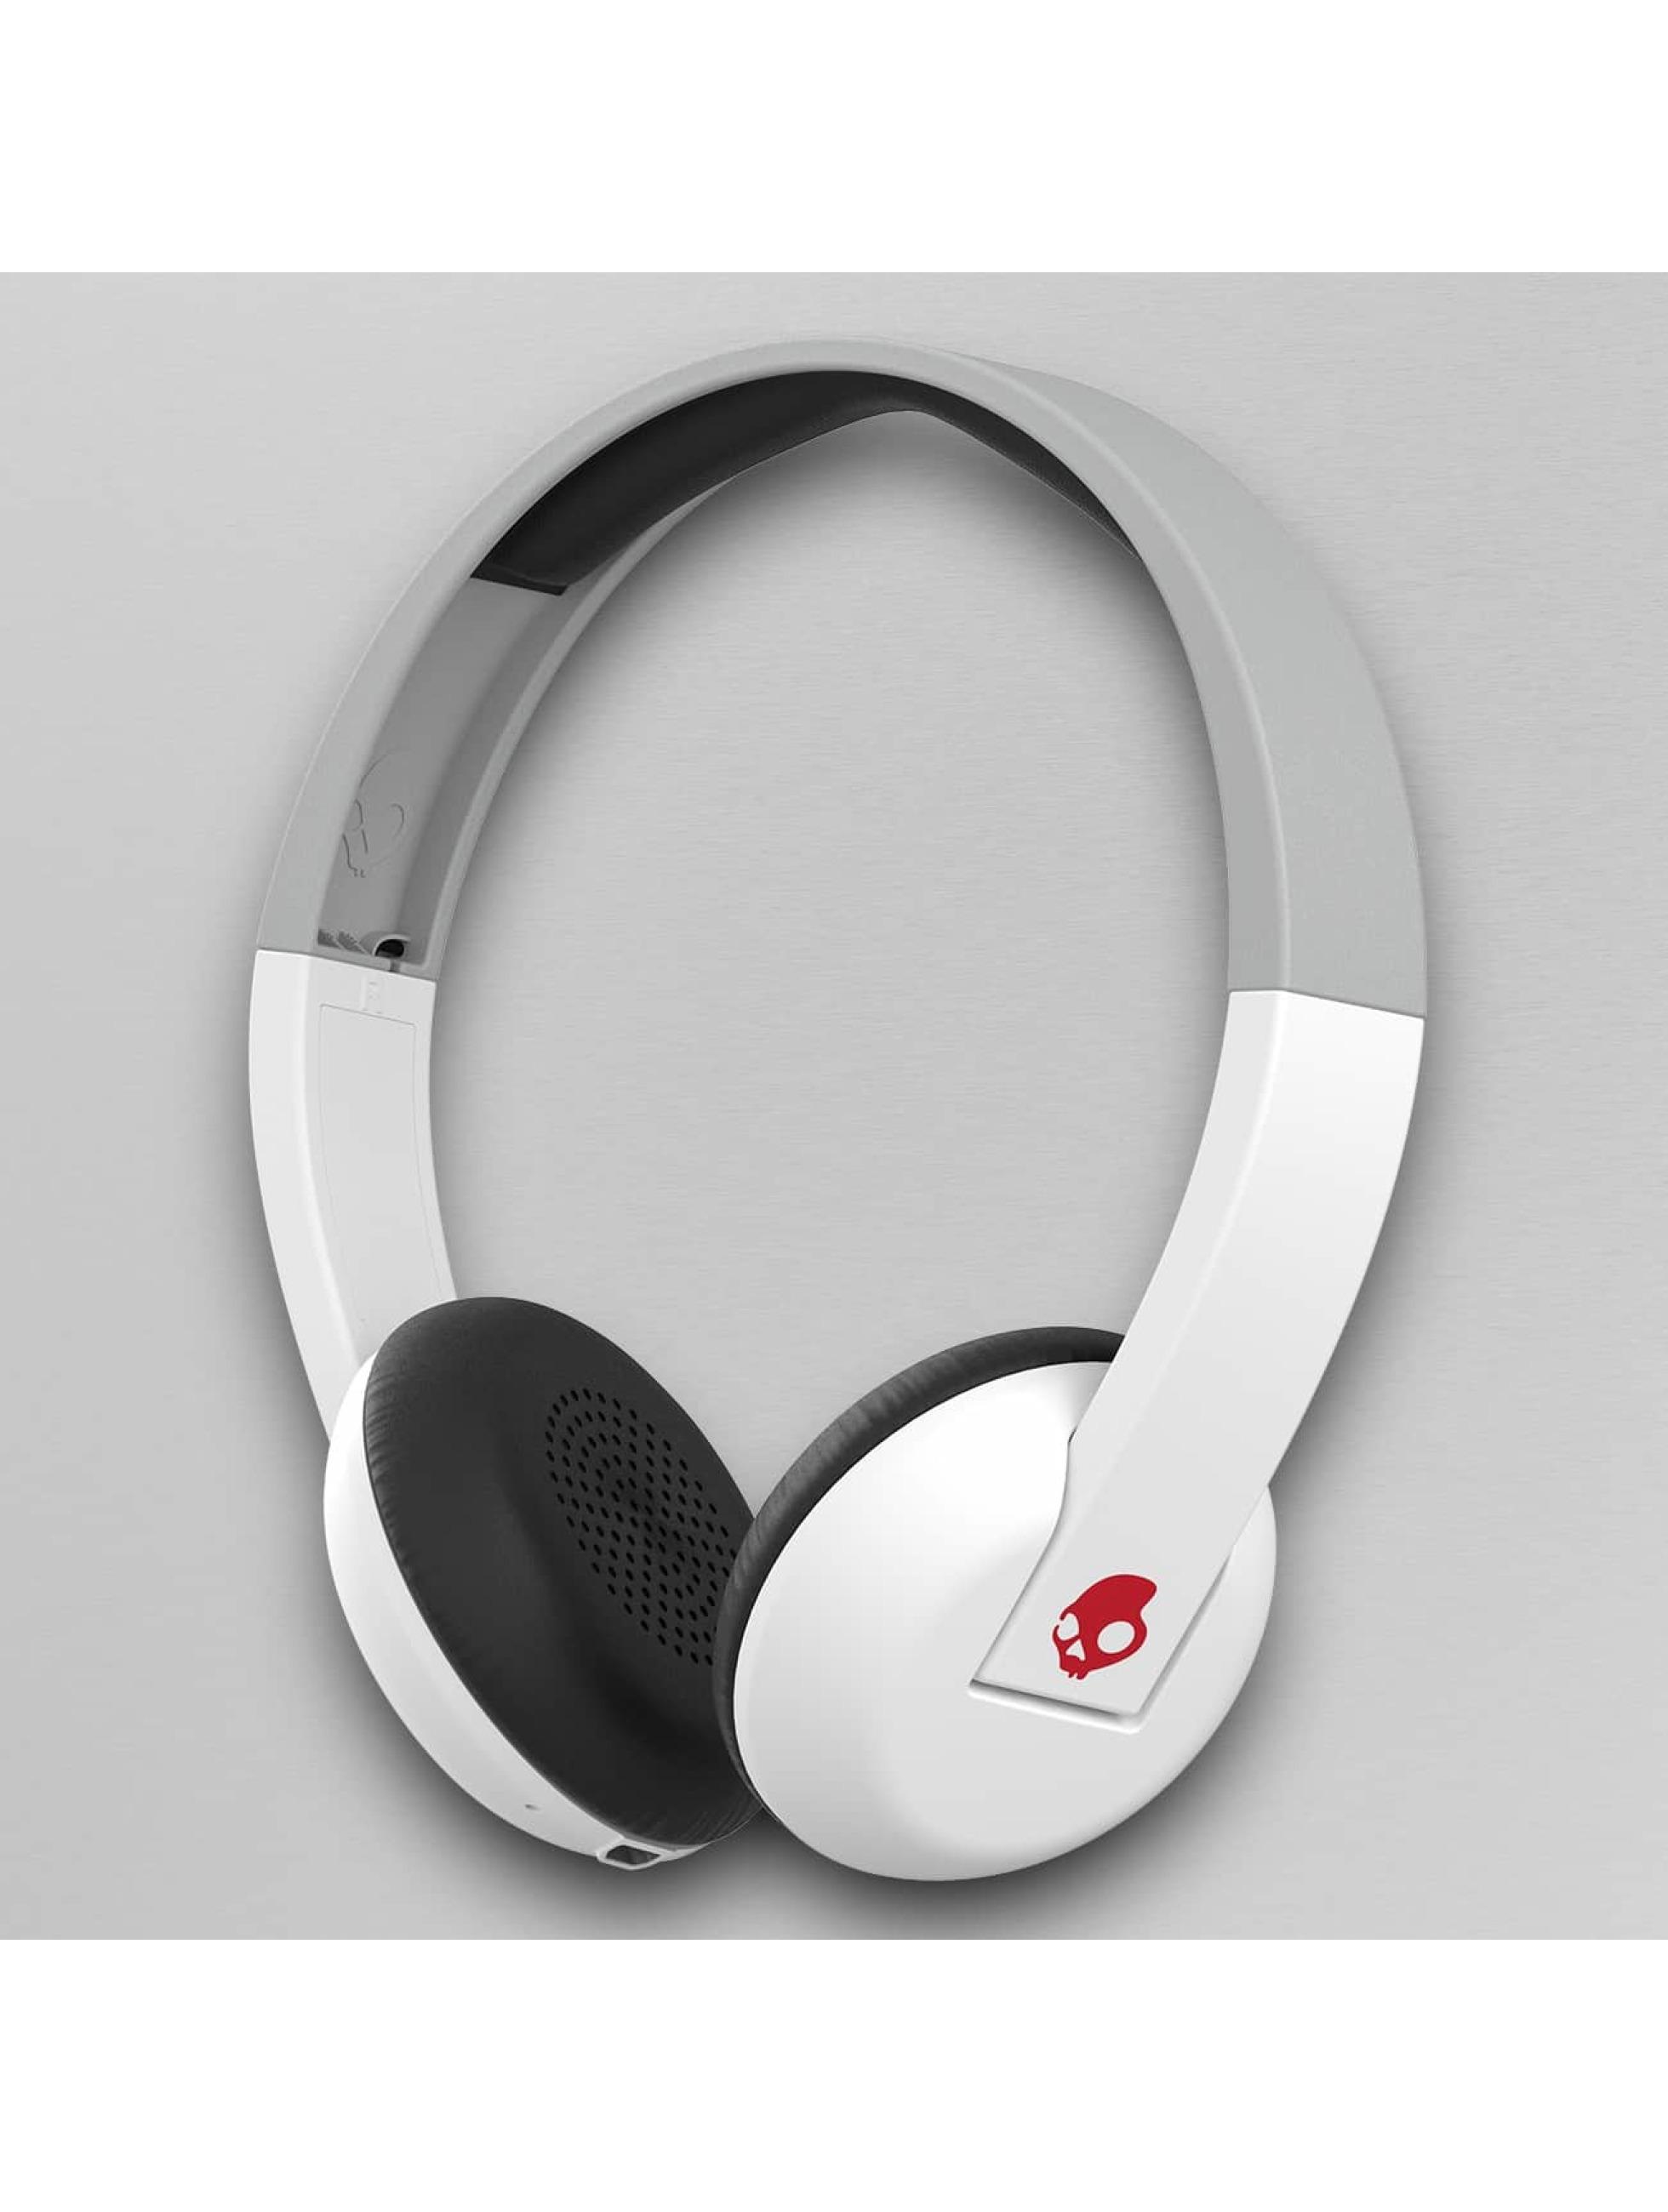 Skullcandy Männer,Frauen Kopfhörer Uproar Wireless On Ear in weiß